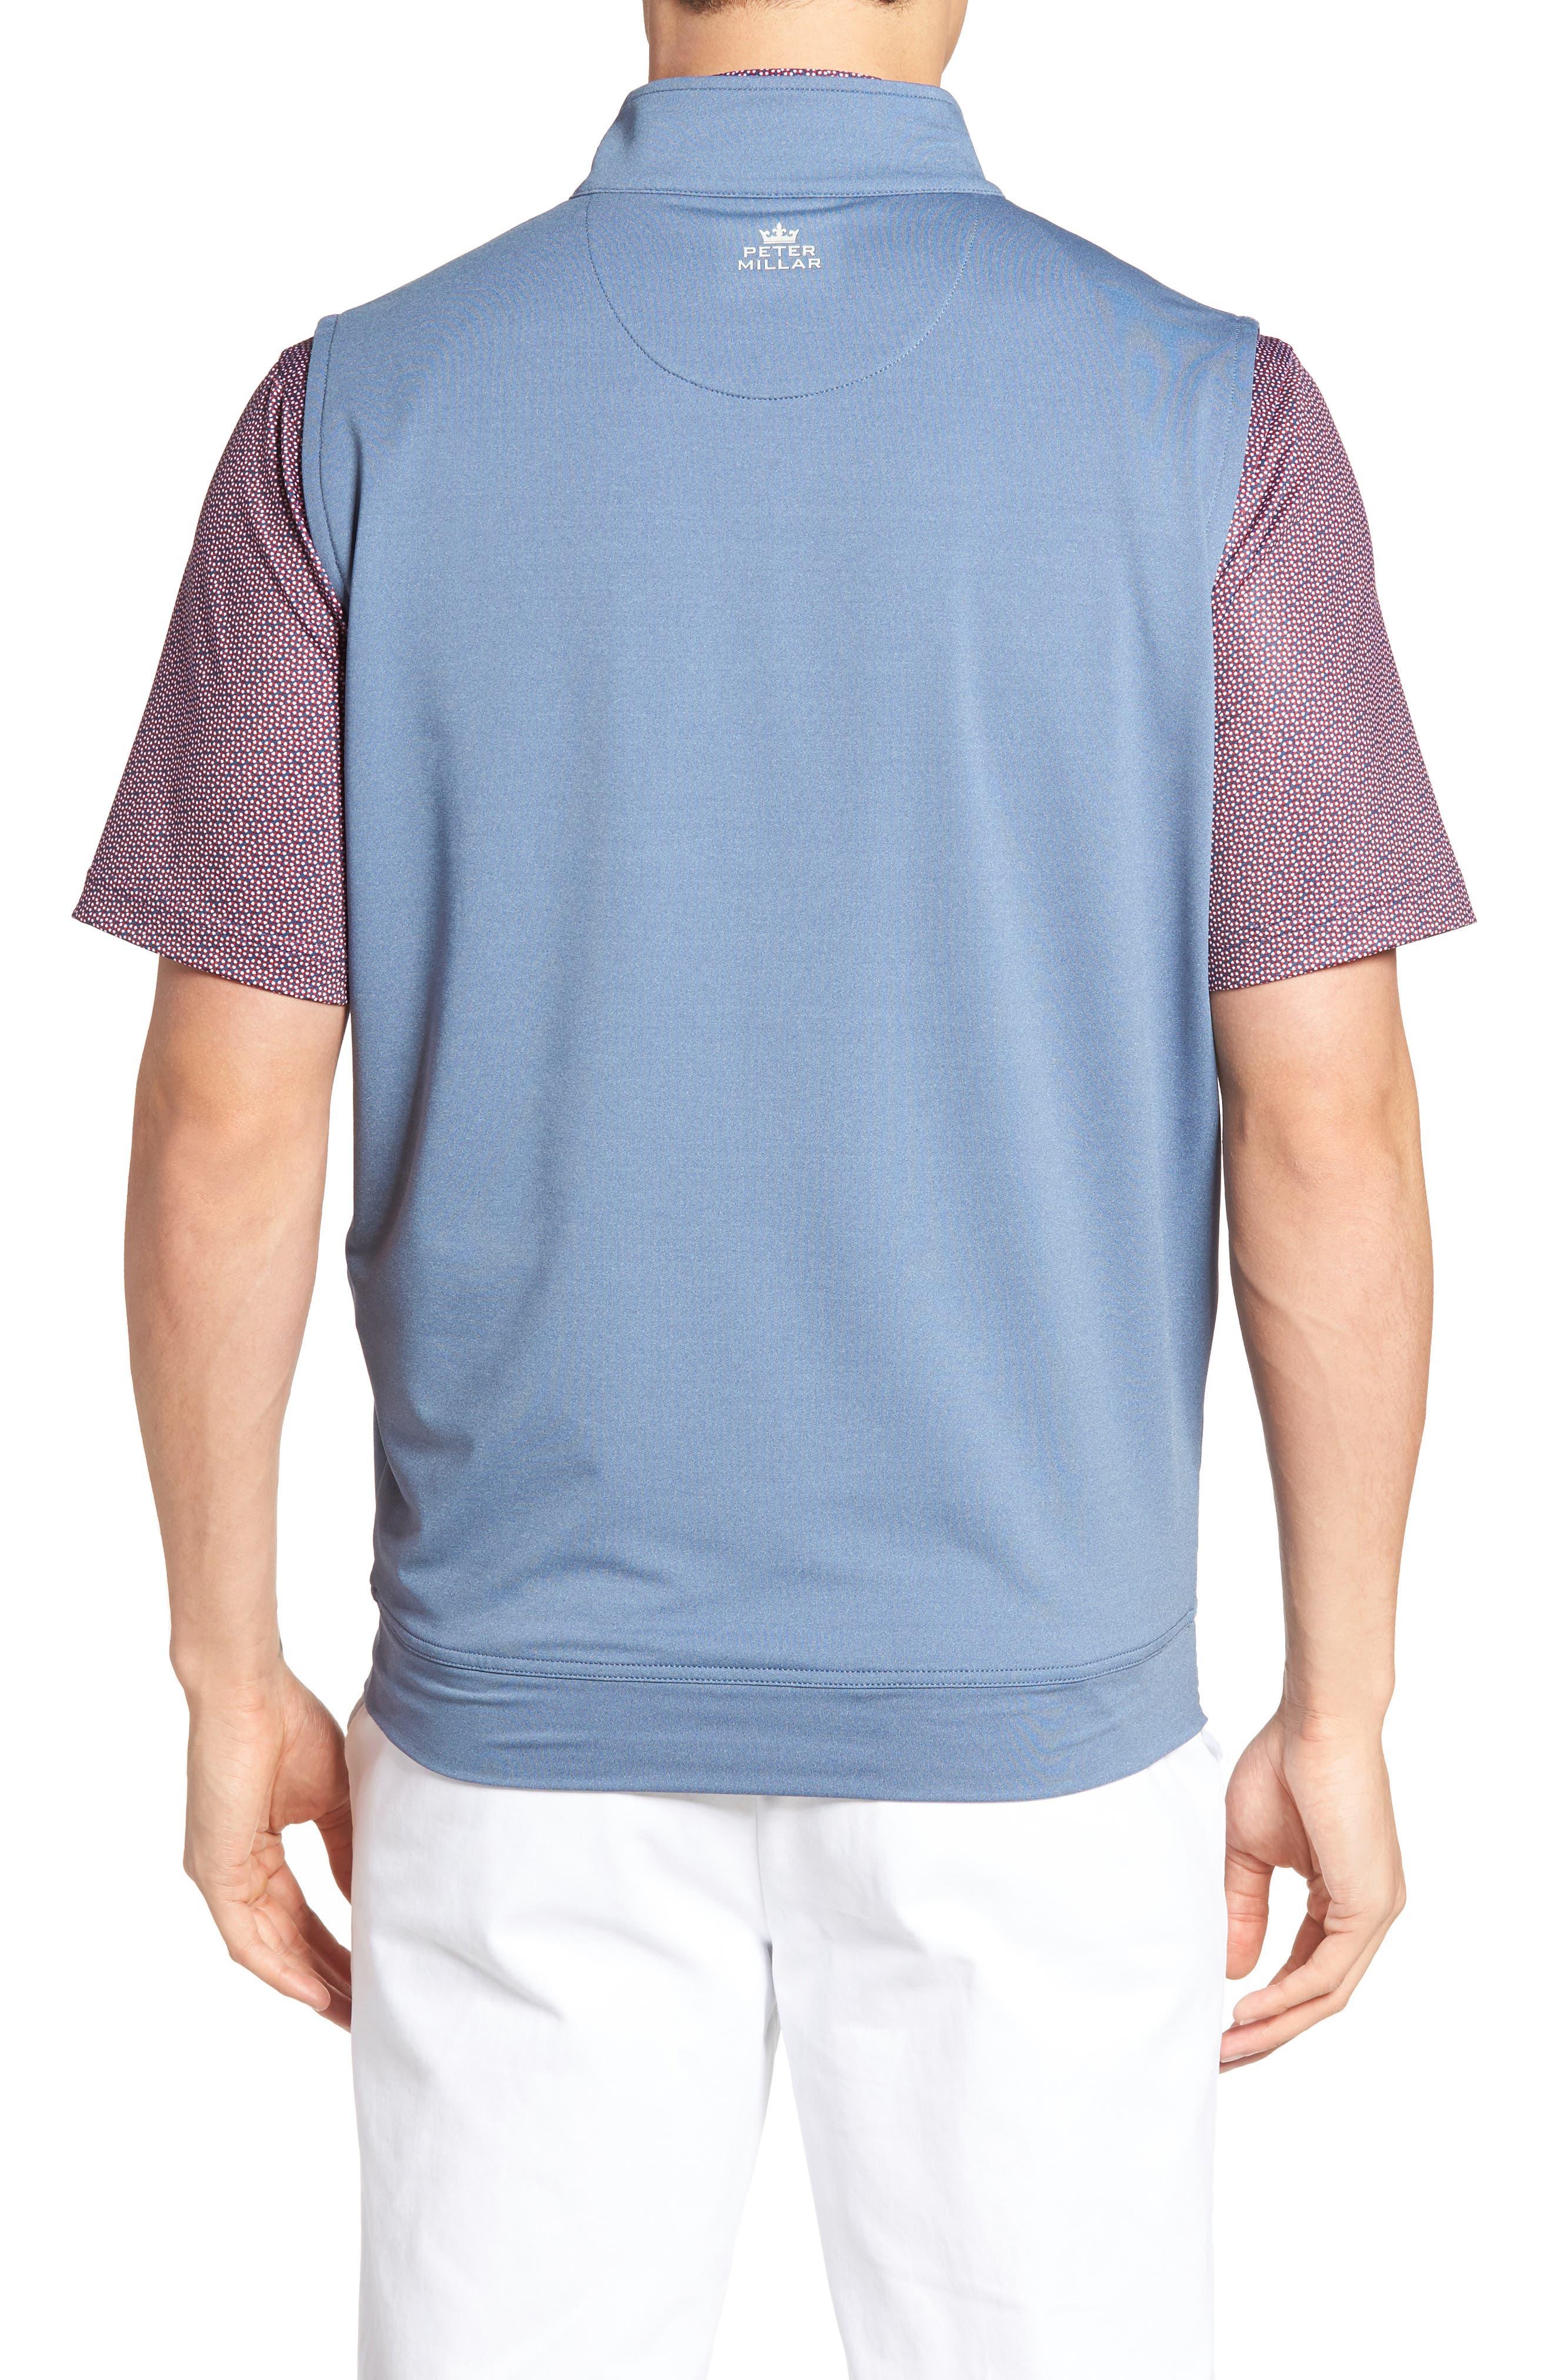 Galway Quarter Zip Vest,                             Alternate thumbnail 2, color,                             402